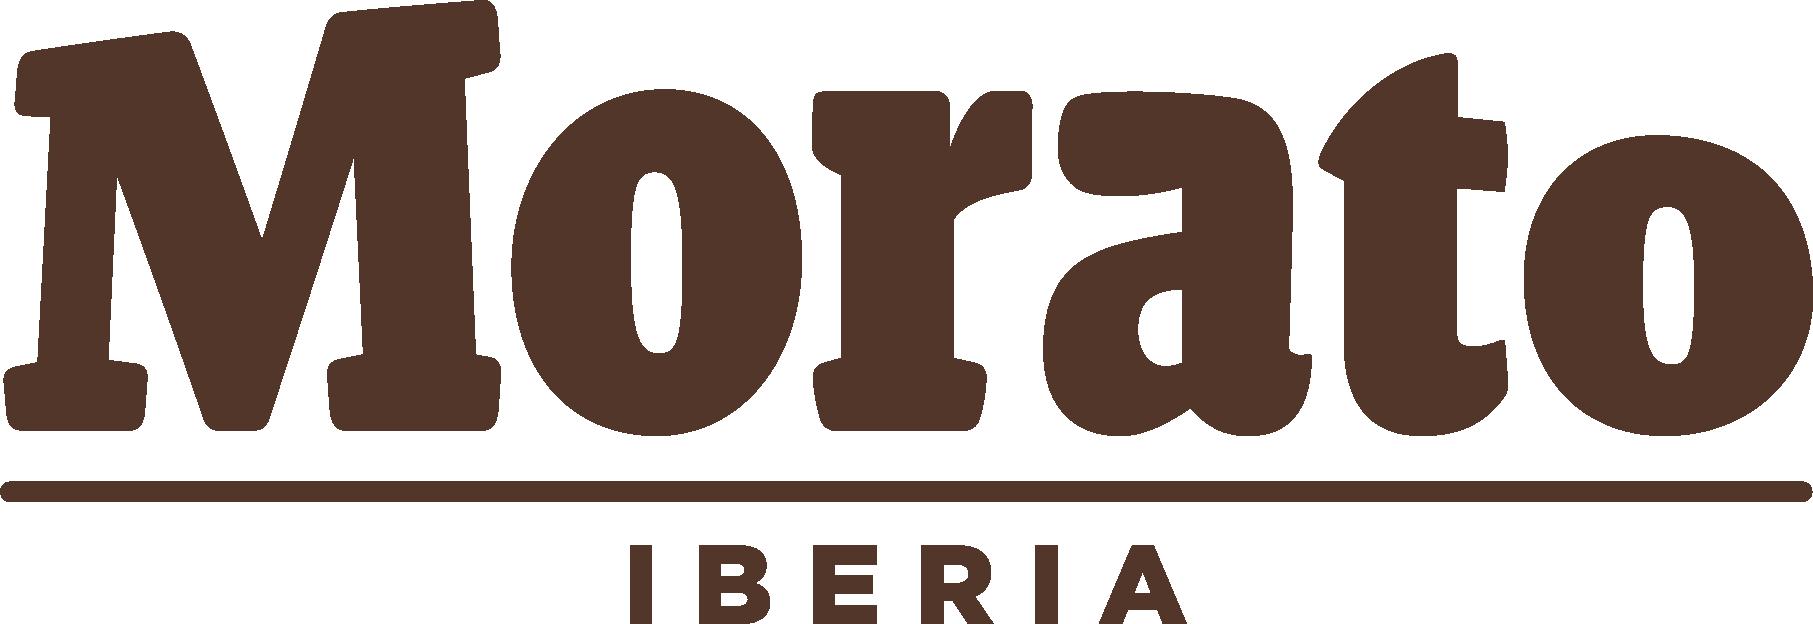 Fabricantes de pan | Morato Iberia